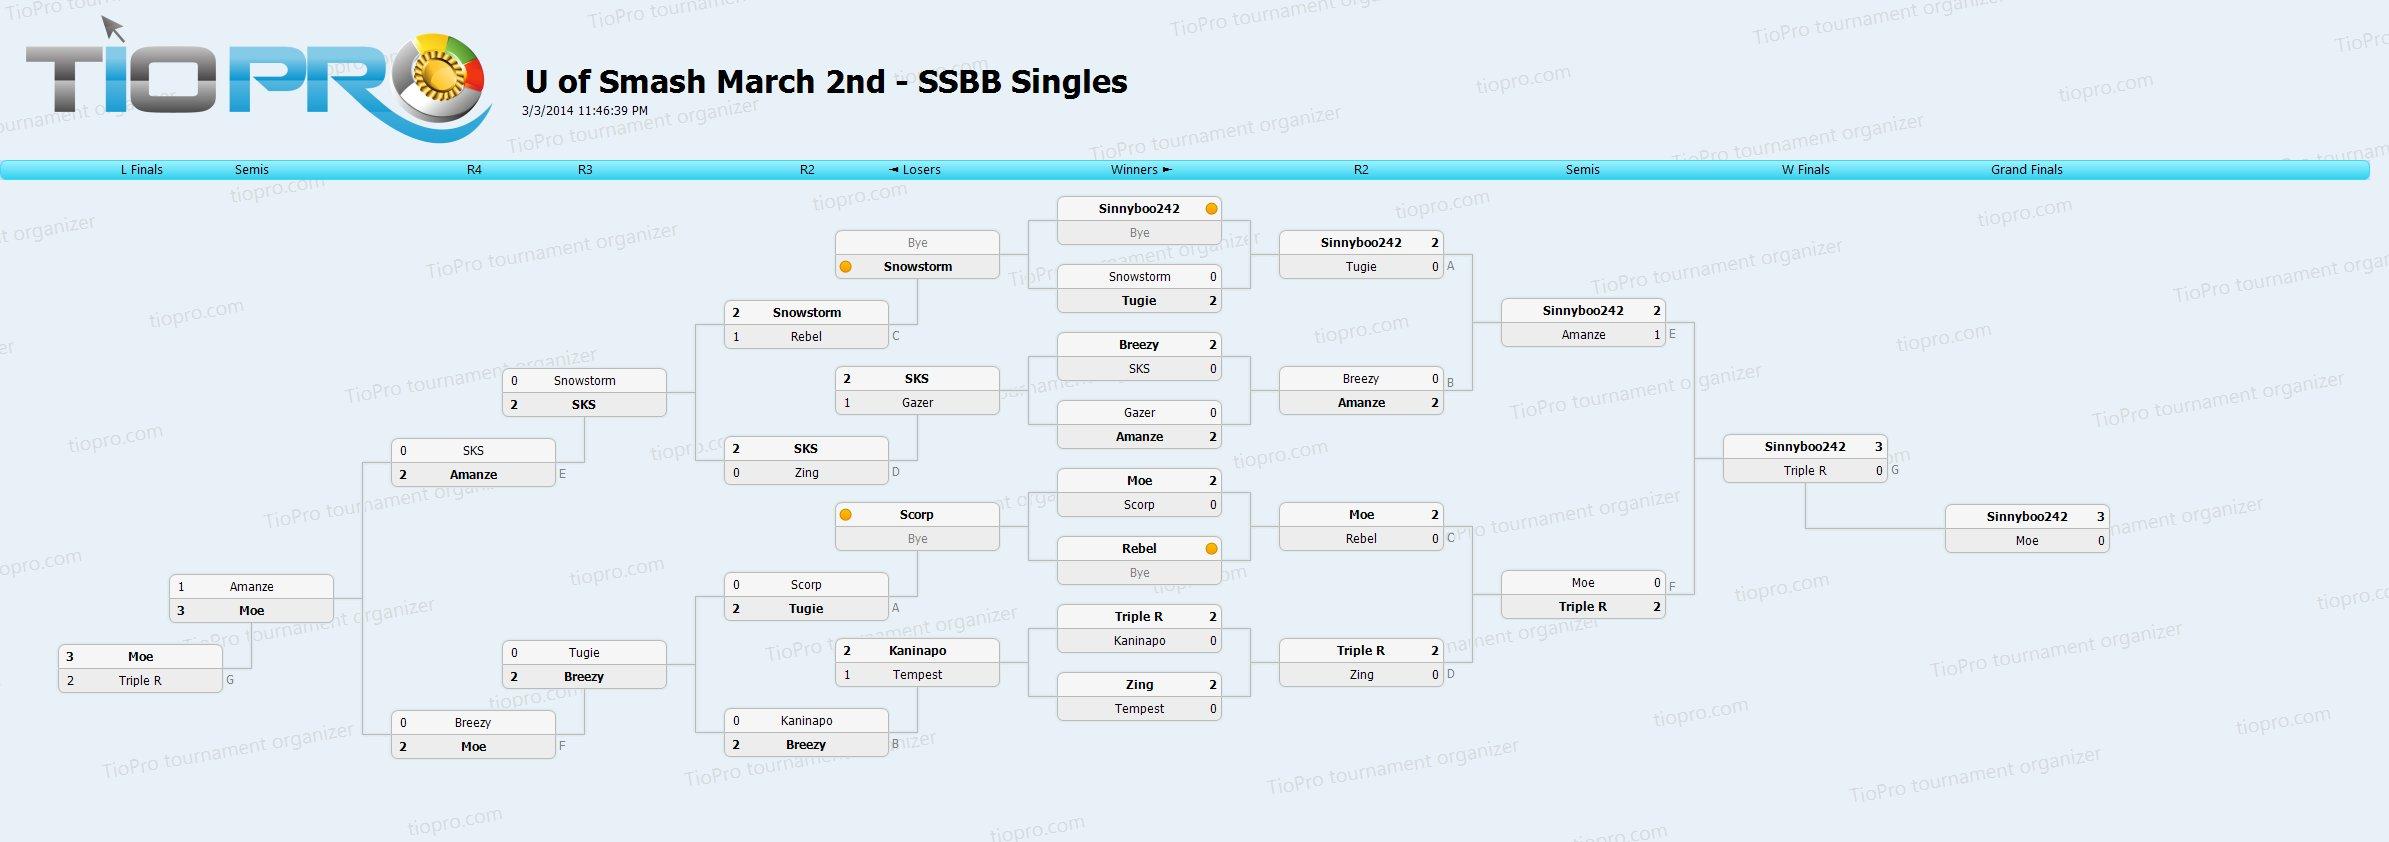 U of M Triweekly (March 2nd, 2014) SSBB Singles Bracket